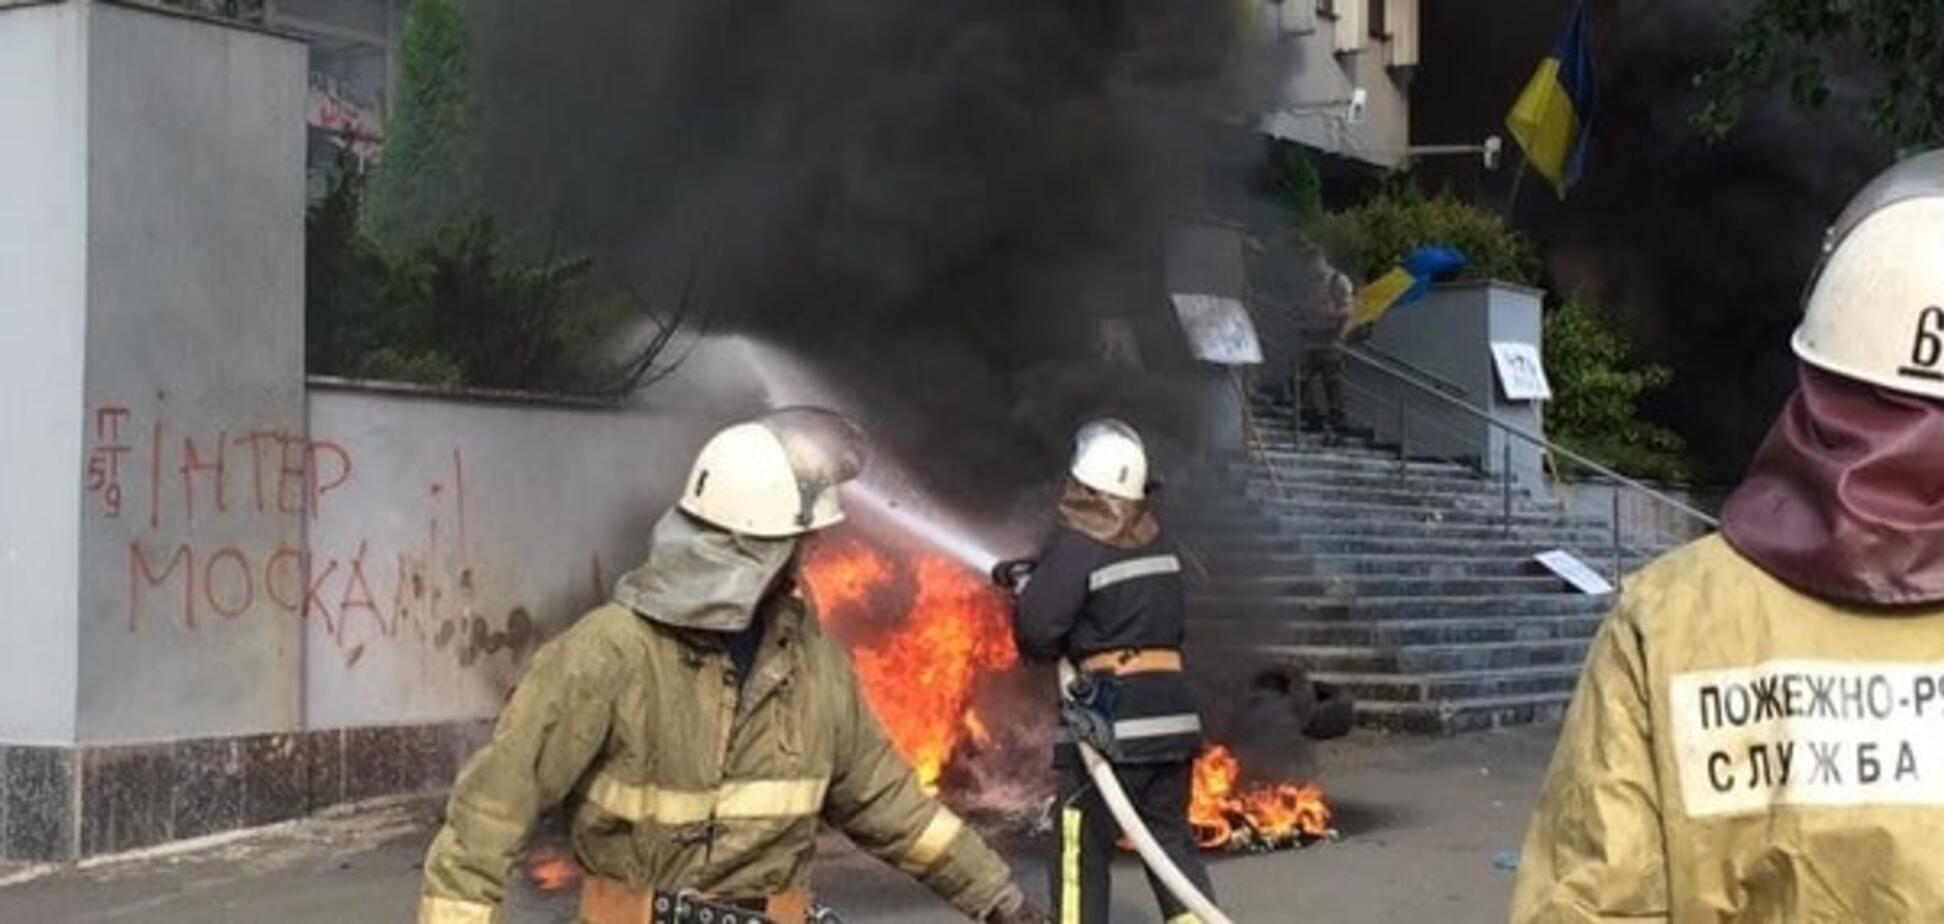 Пожар на Интере